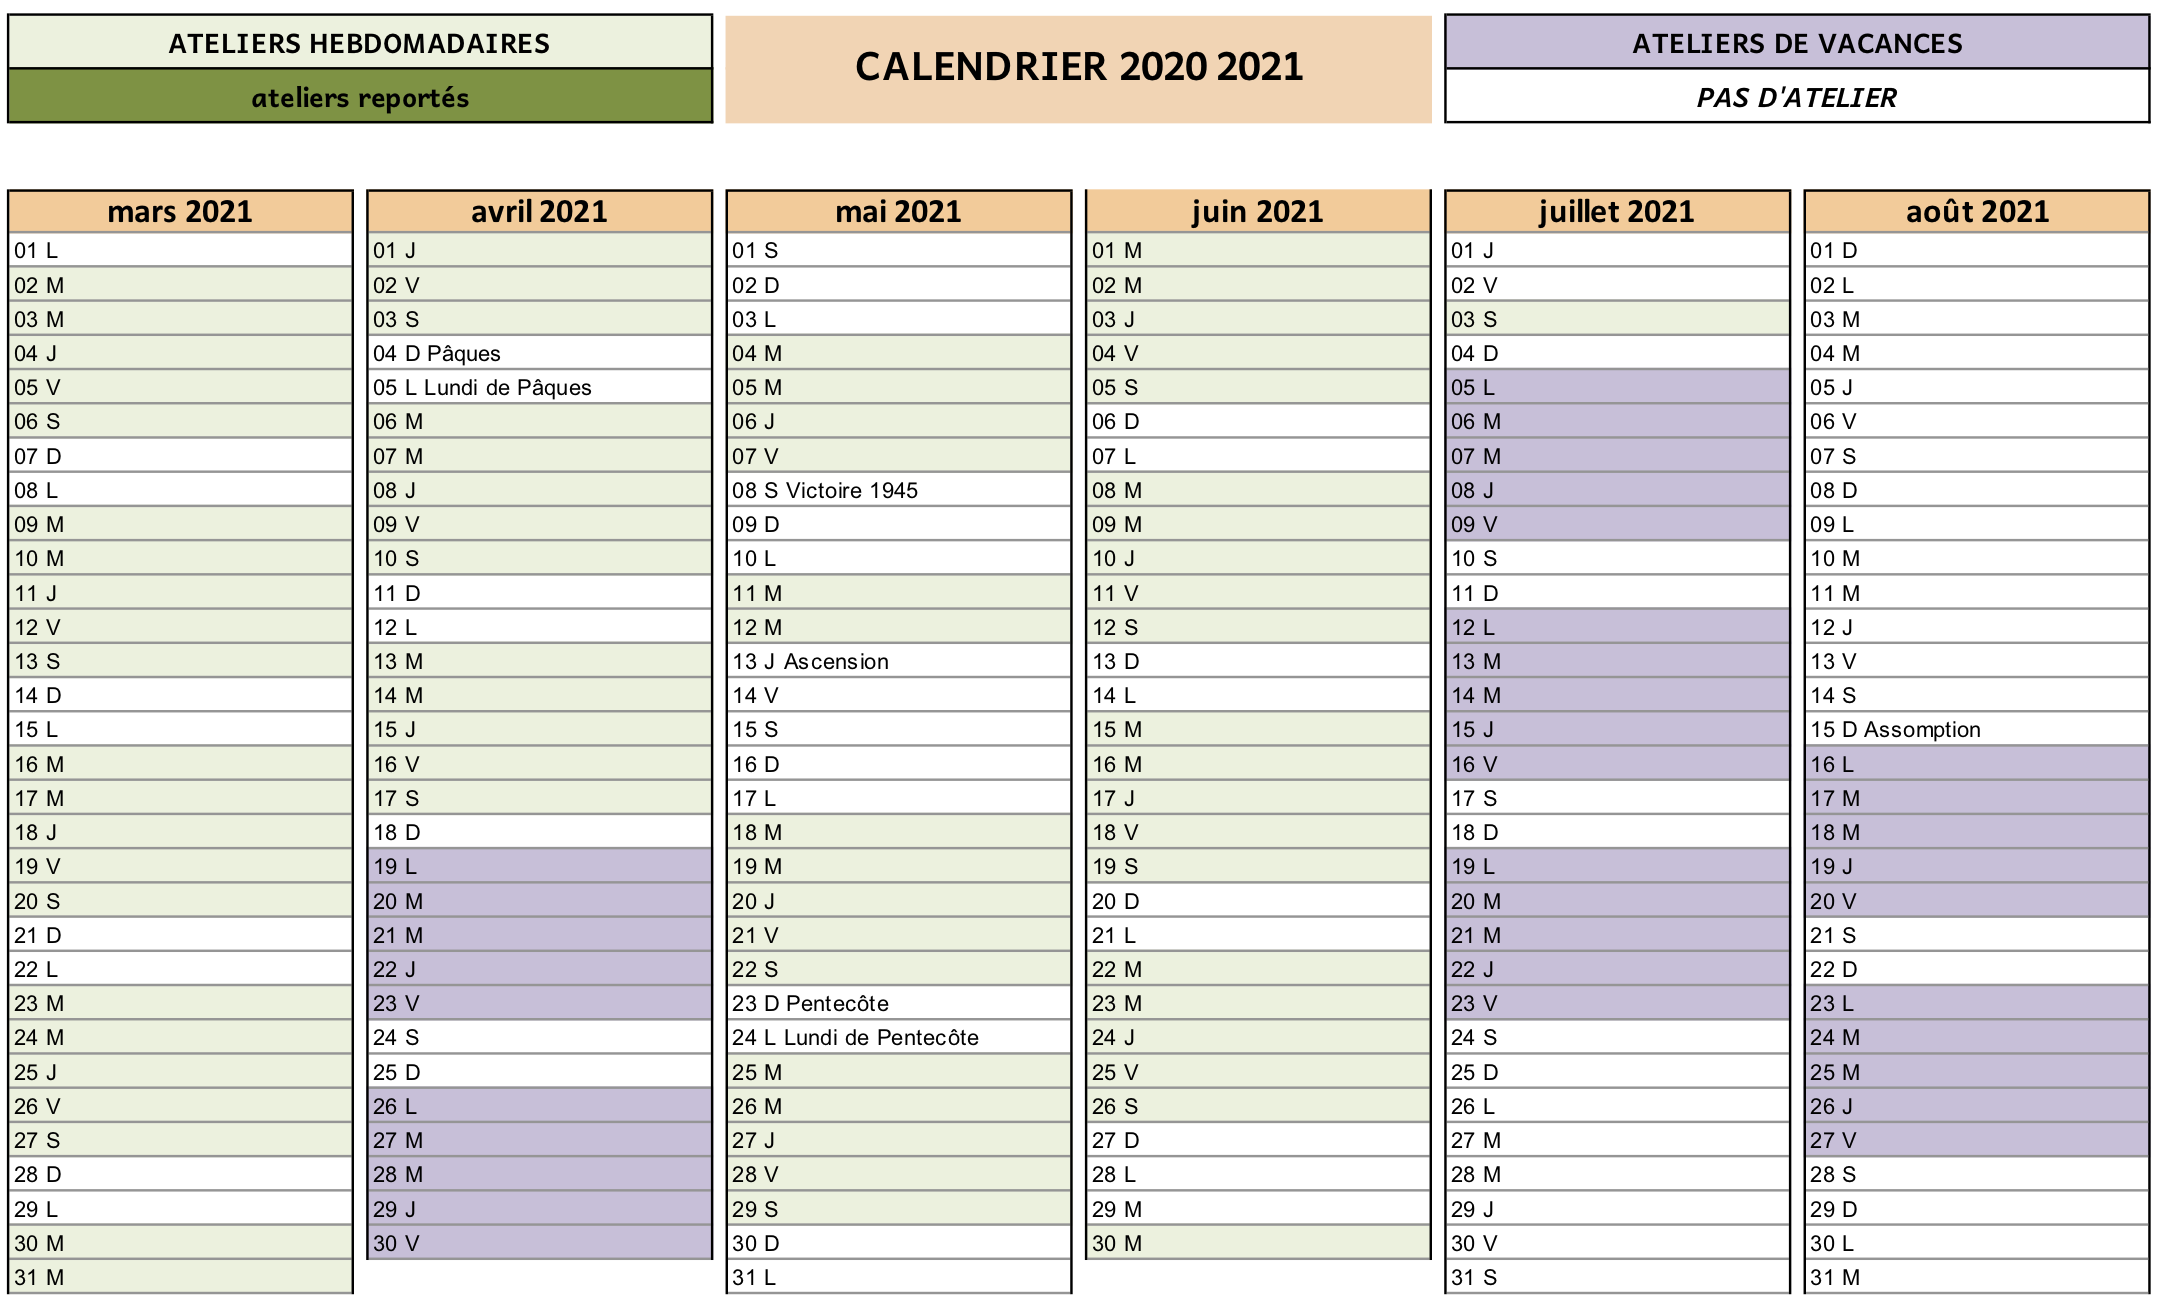 Calendrier Cdm 2021 CdM calendrier 20120 2021 visio 2   Cour des marguerites